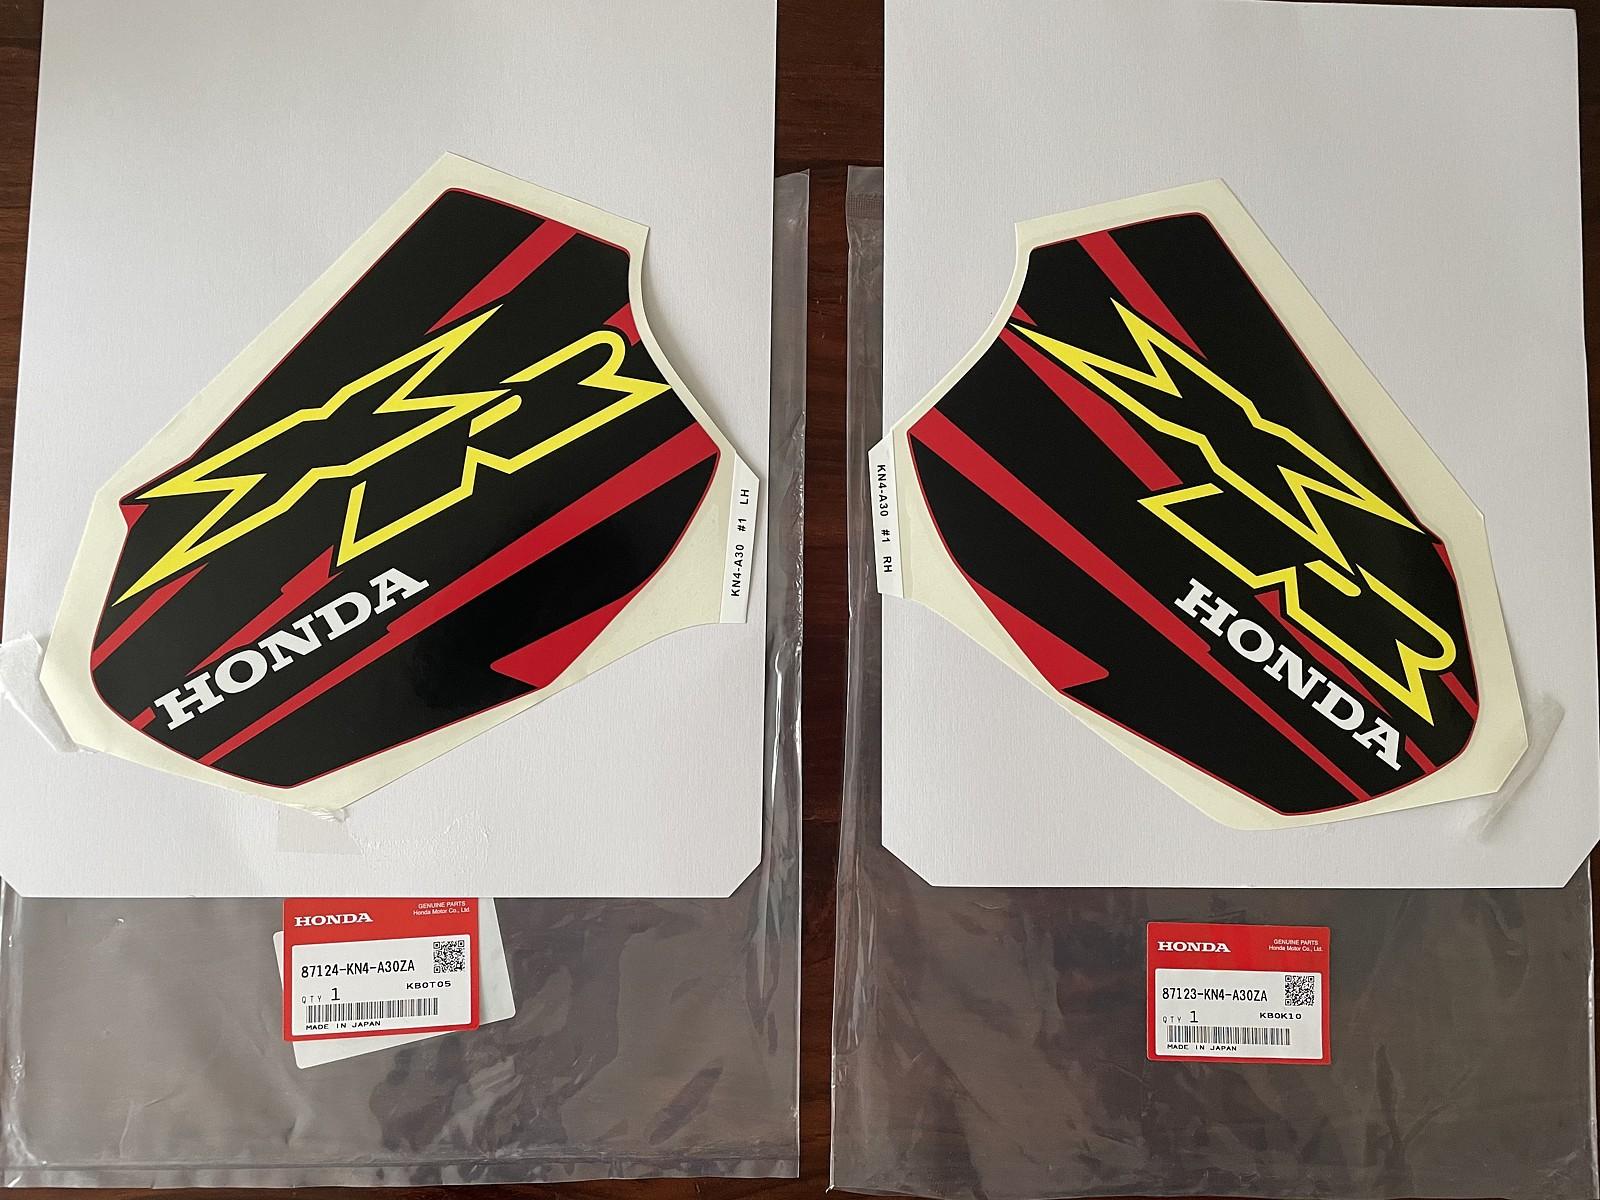 FD76E26C-320C-407A-B6FA-5C3114C6960B - Godcho - Motocross Pictures - Vital MX